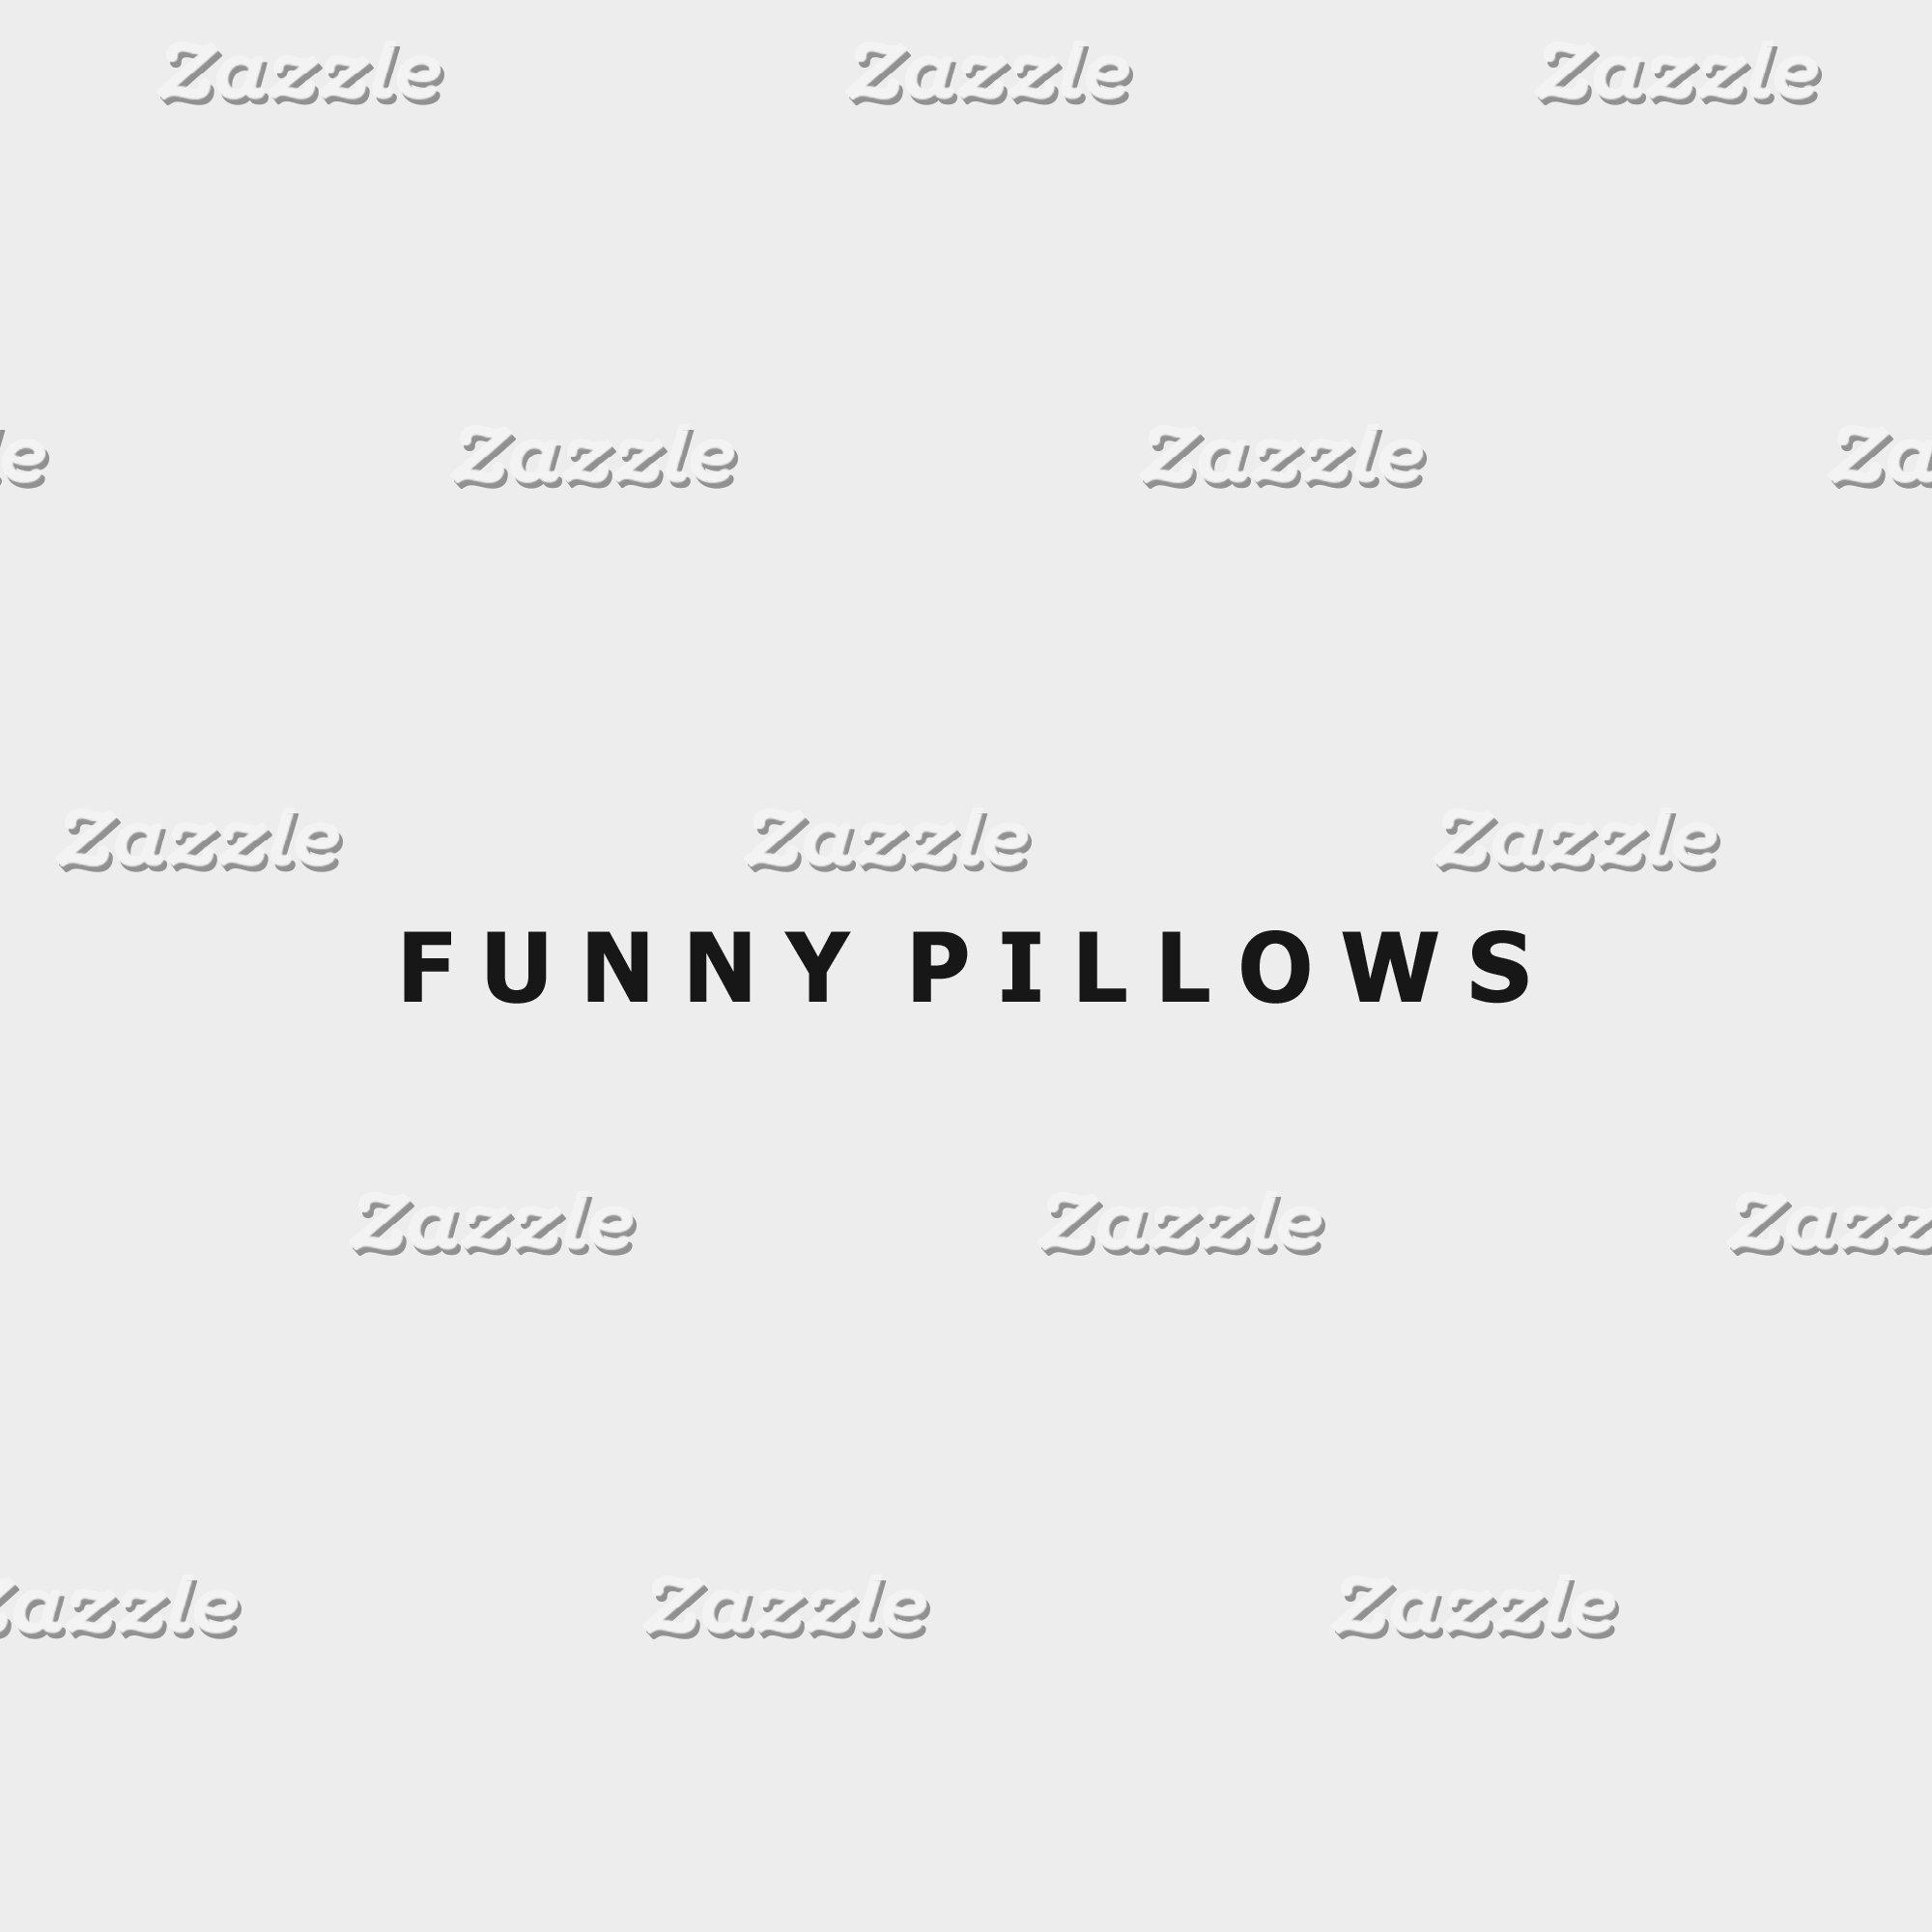 Funny Pillows